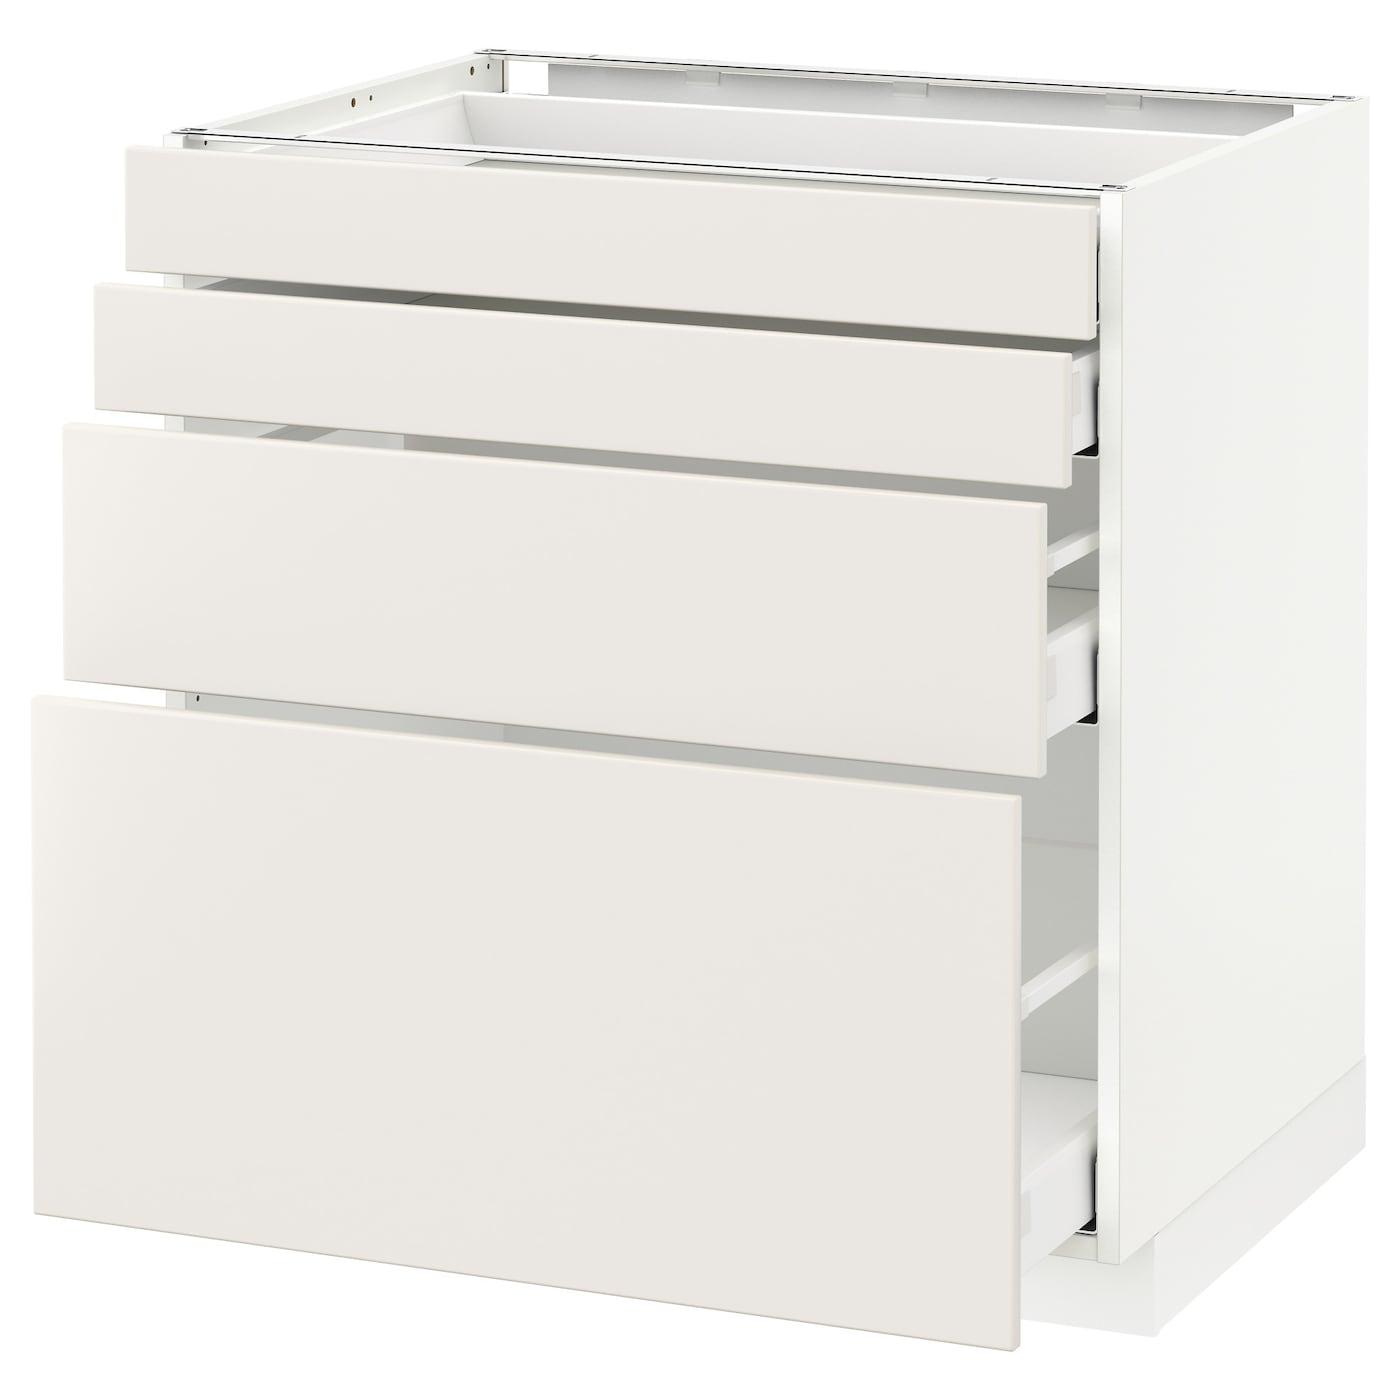 METOD / MAXIMERA Élt bas 15 faces/15 tiroirs - blanc/Veddinge blanc 15x15 cm